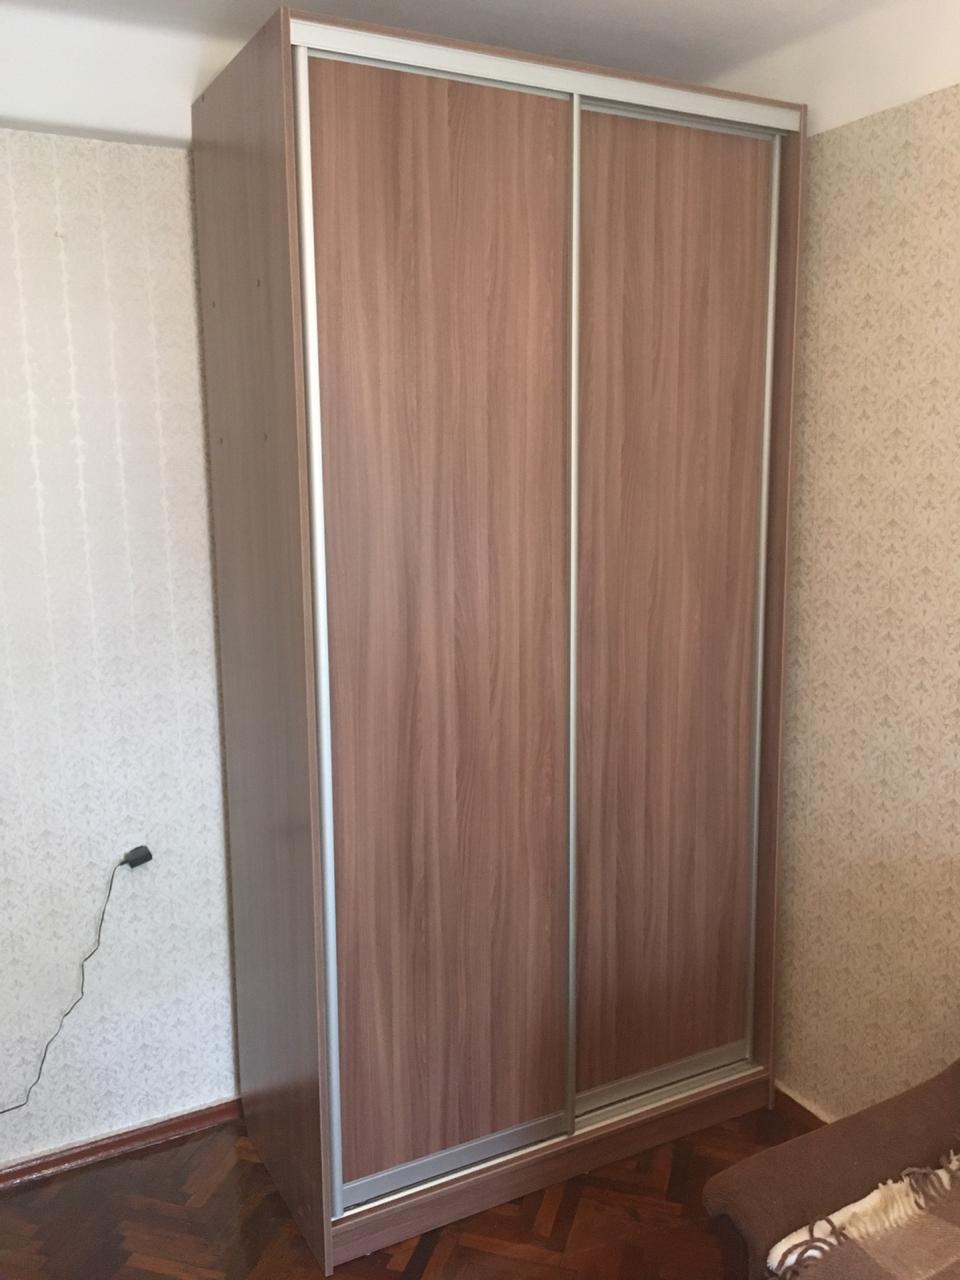 Шкаф-купе 2-х створчатый ЛДСП Ясень Шимо темный